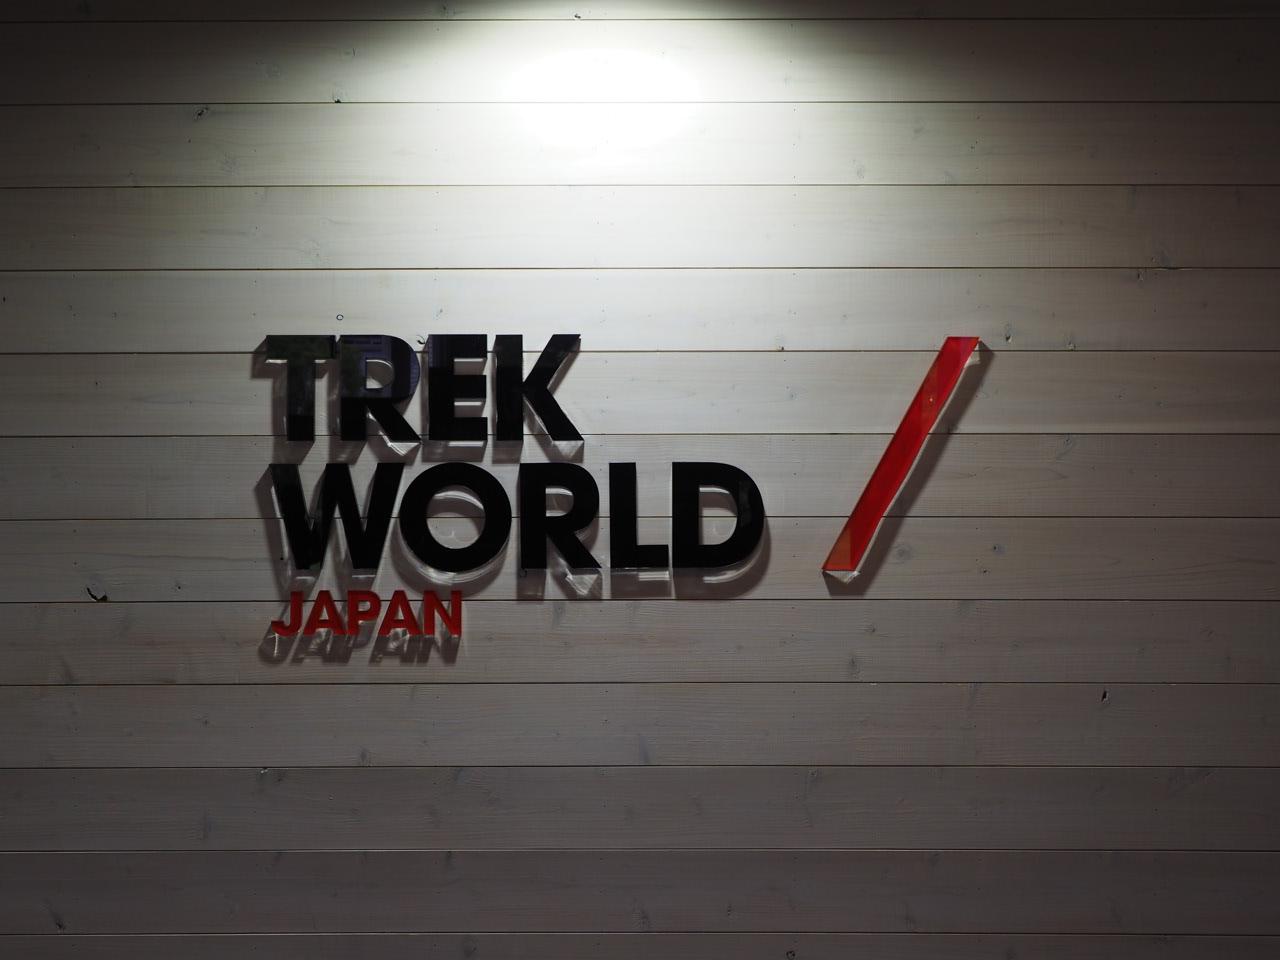 TREK(トレック)の2019年モデル新製品発表会「TREK WORLD 2019(トレックワールド2019)」へ行ってきました!